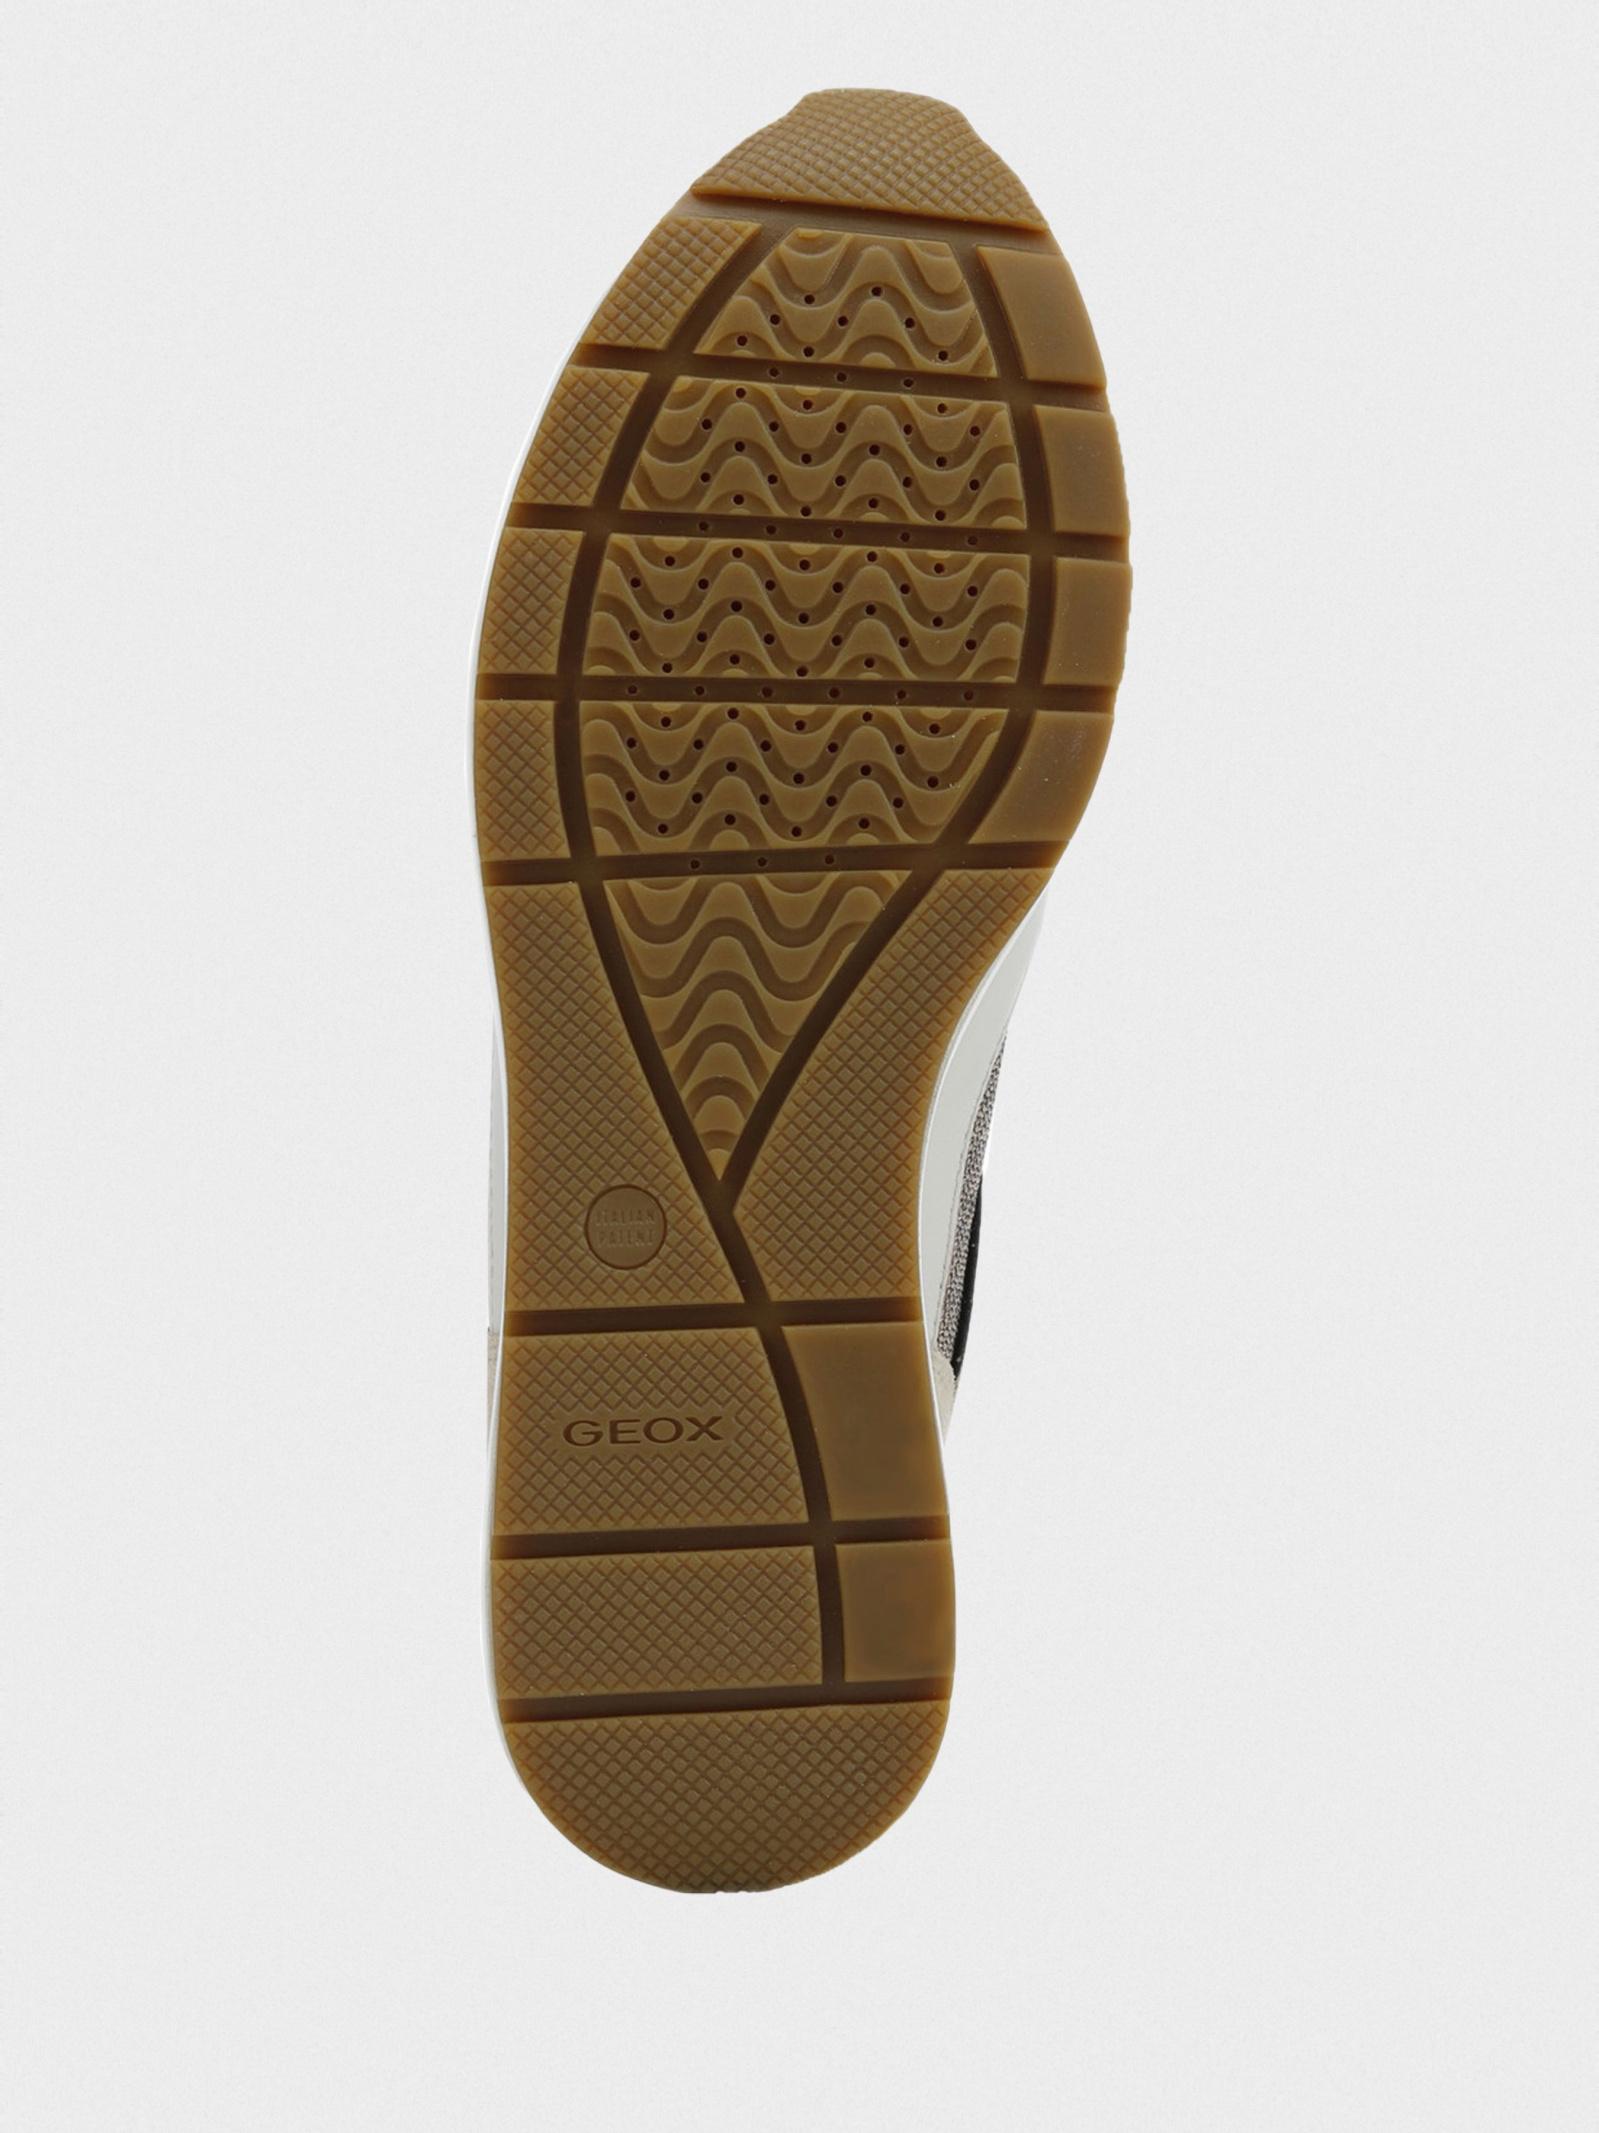 Ботинки для женщин Geox D ZOSMA XW3796 купить обувь, 2017